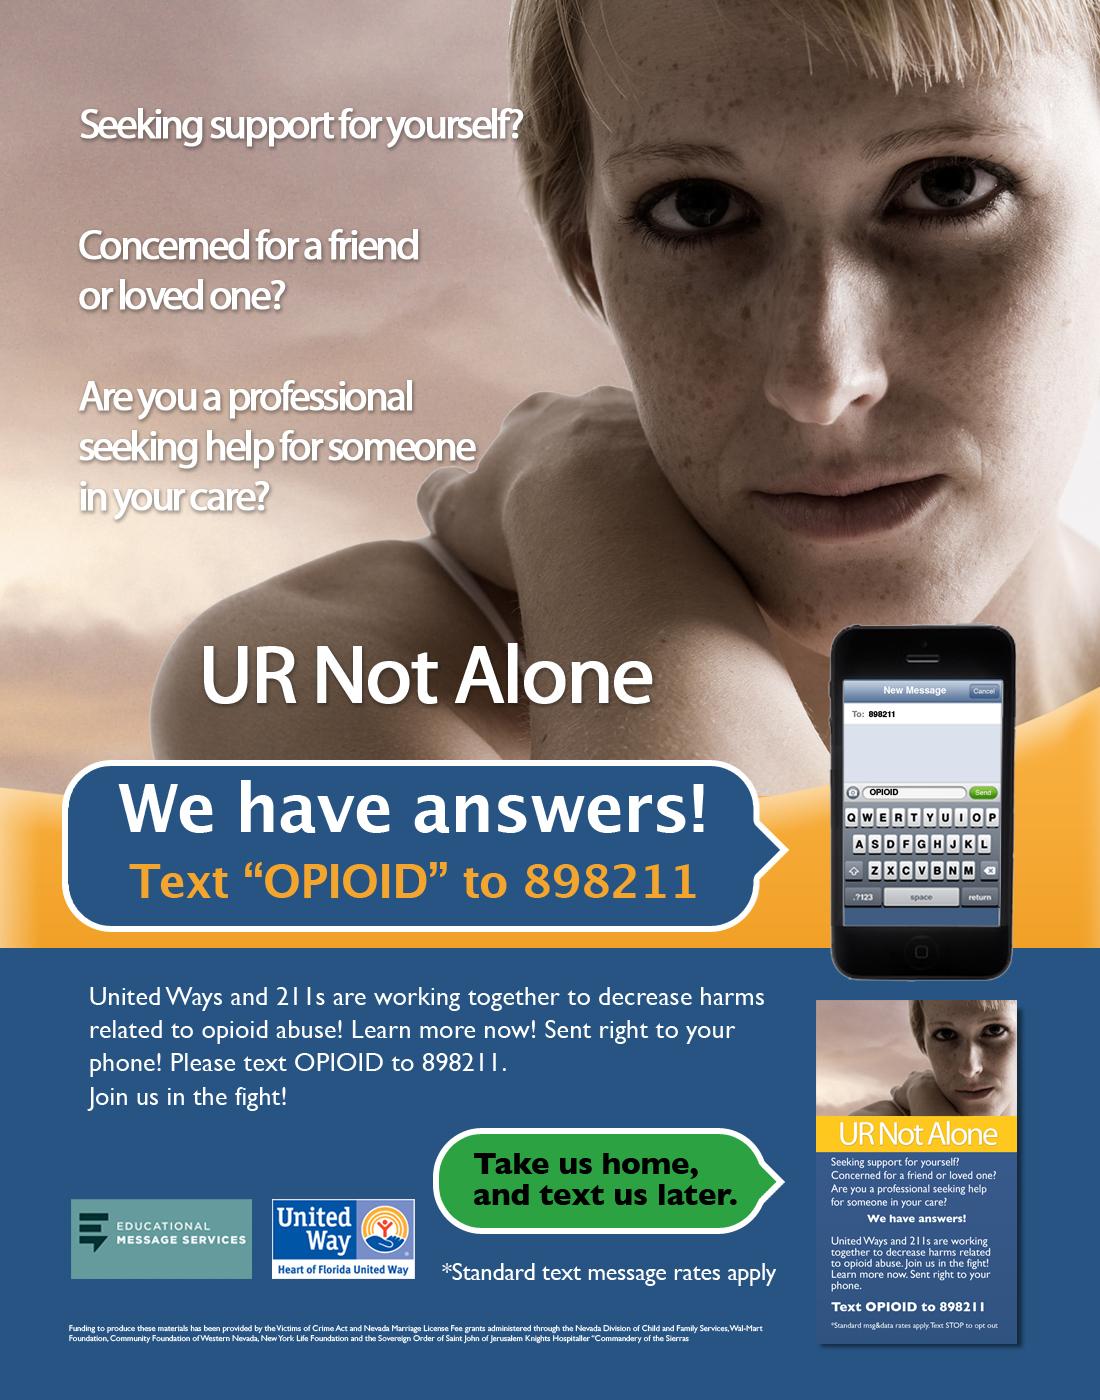 opioids_girl_poster3.jpg